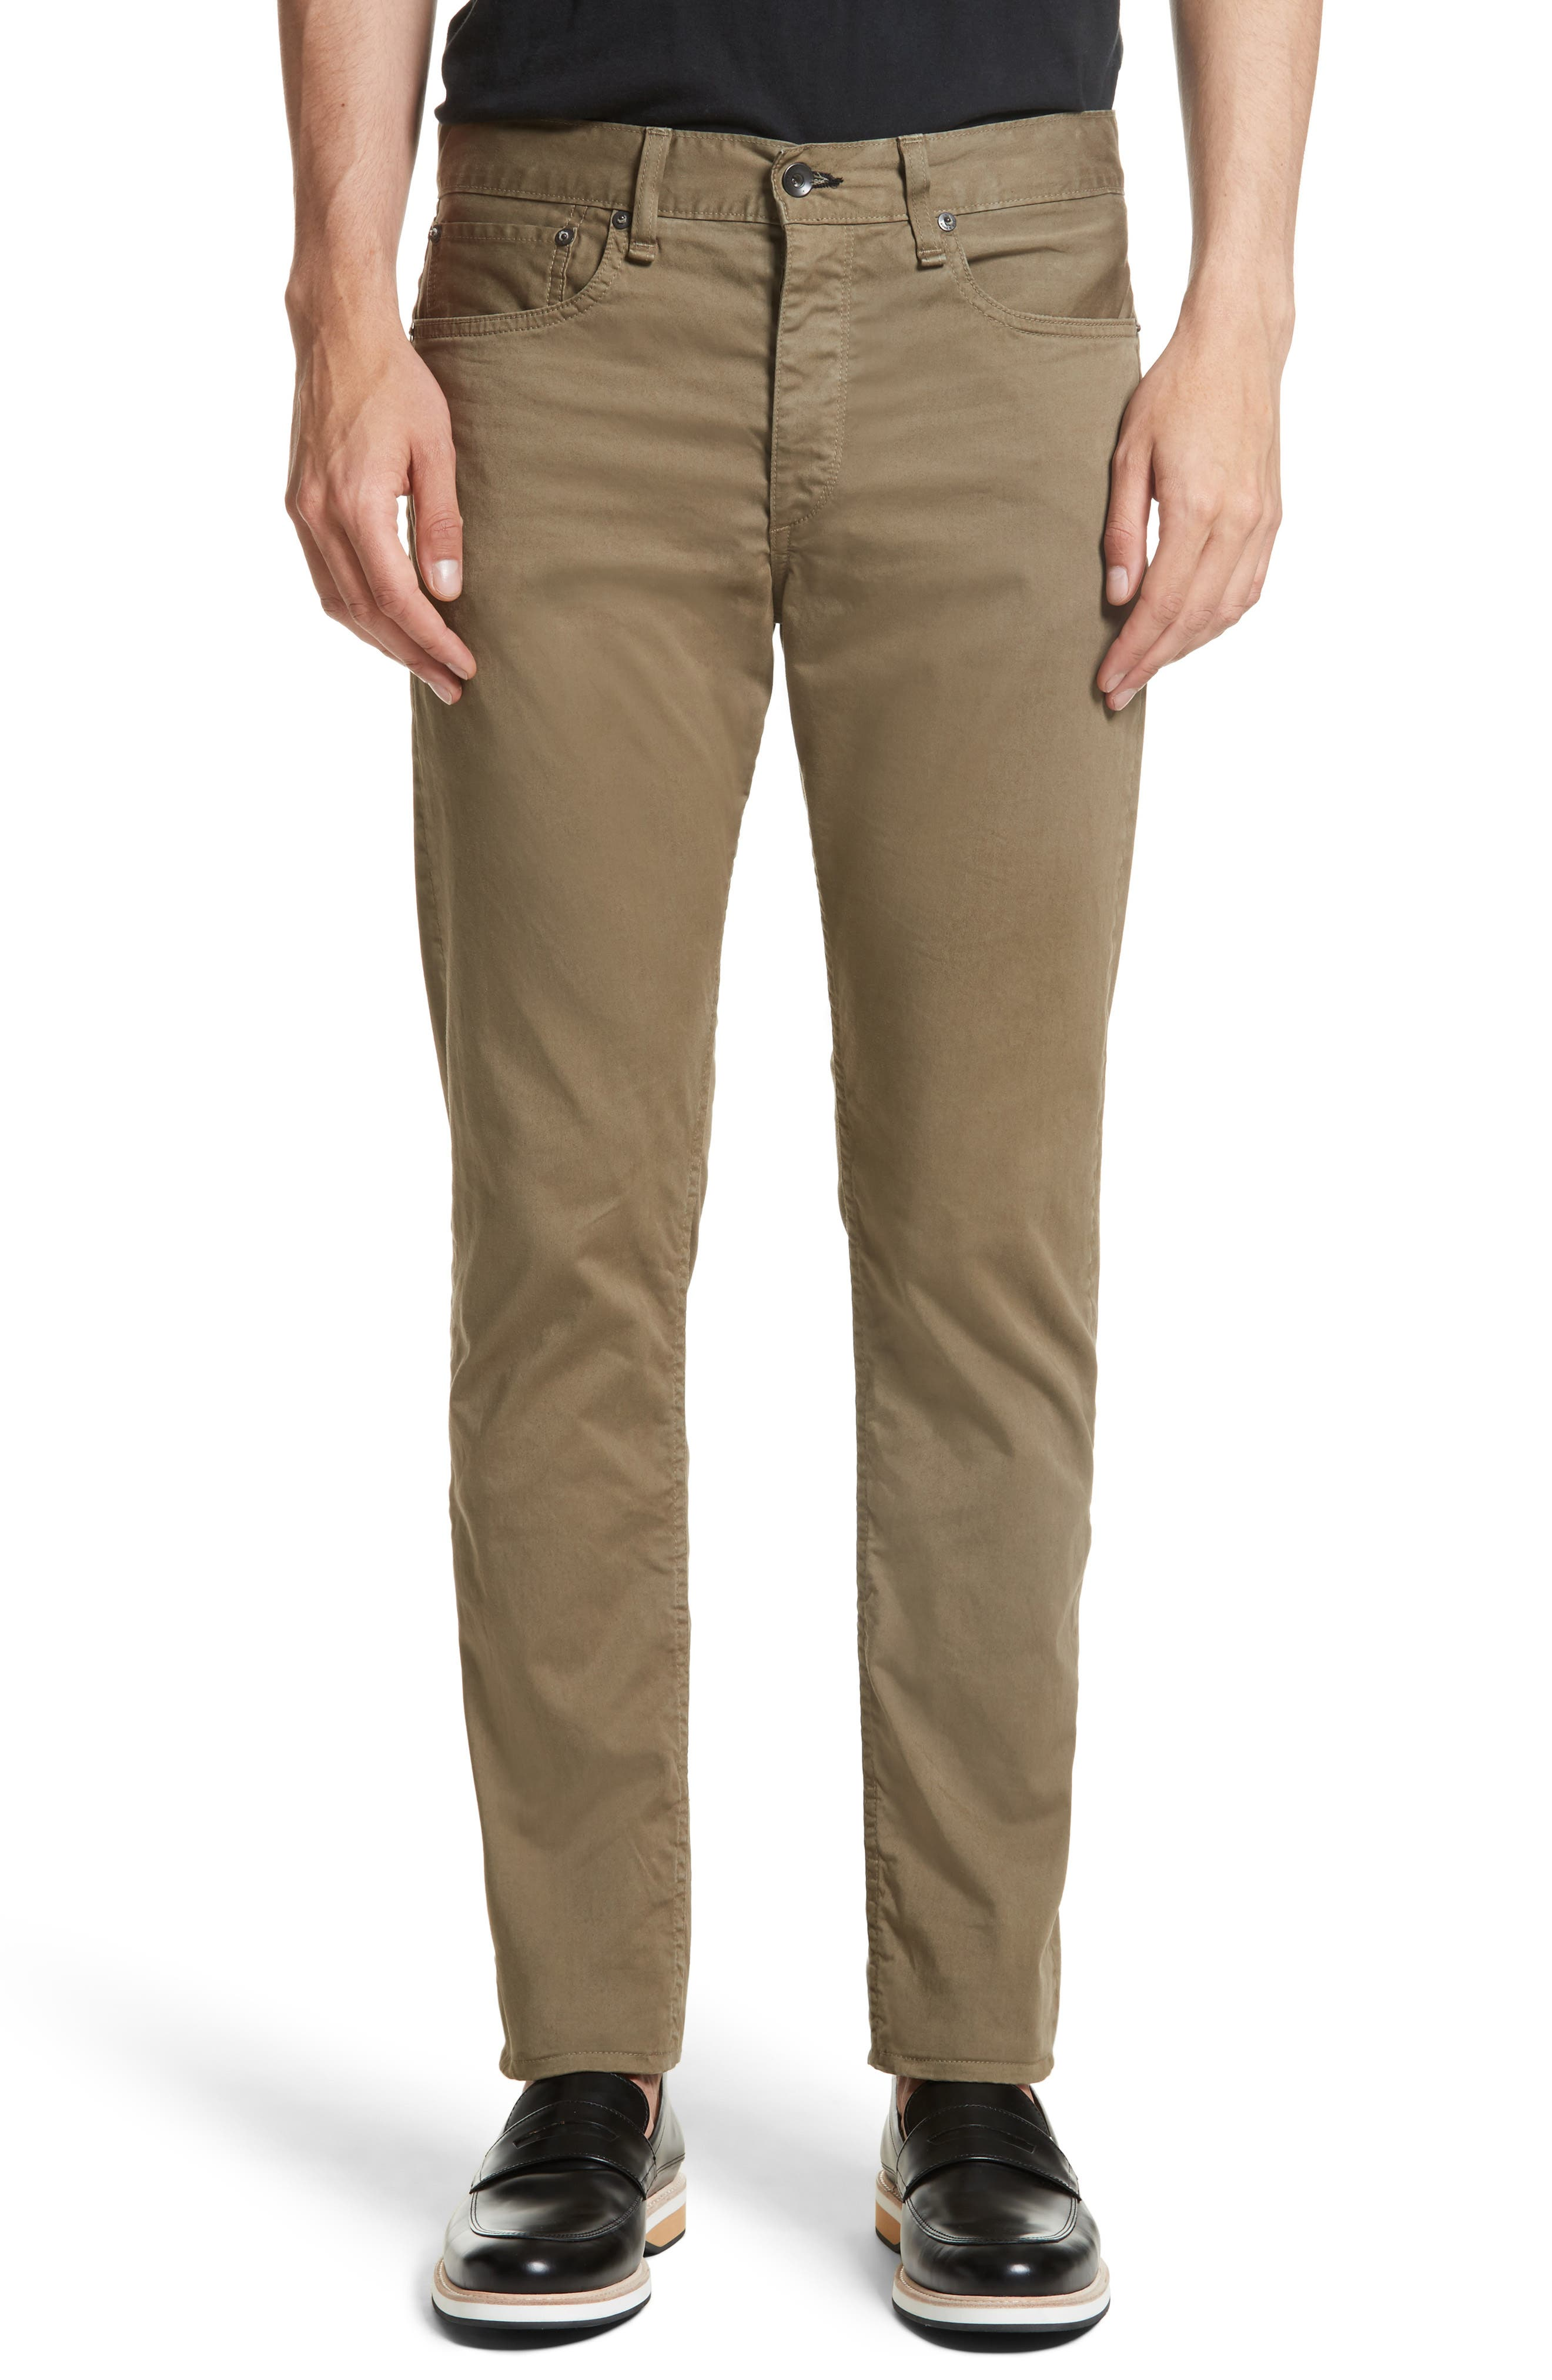 Fit 2 Five-Pocket Twill Pants,                             Main thumbnail 1, color,                             319